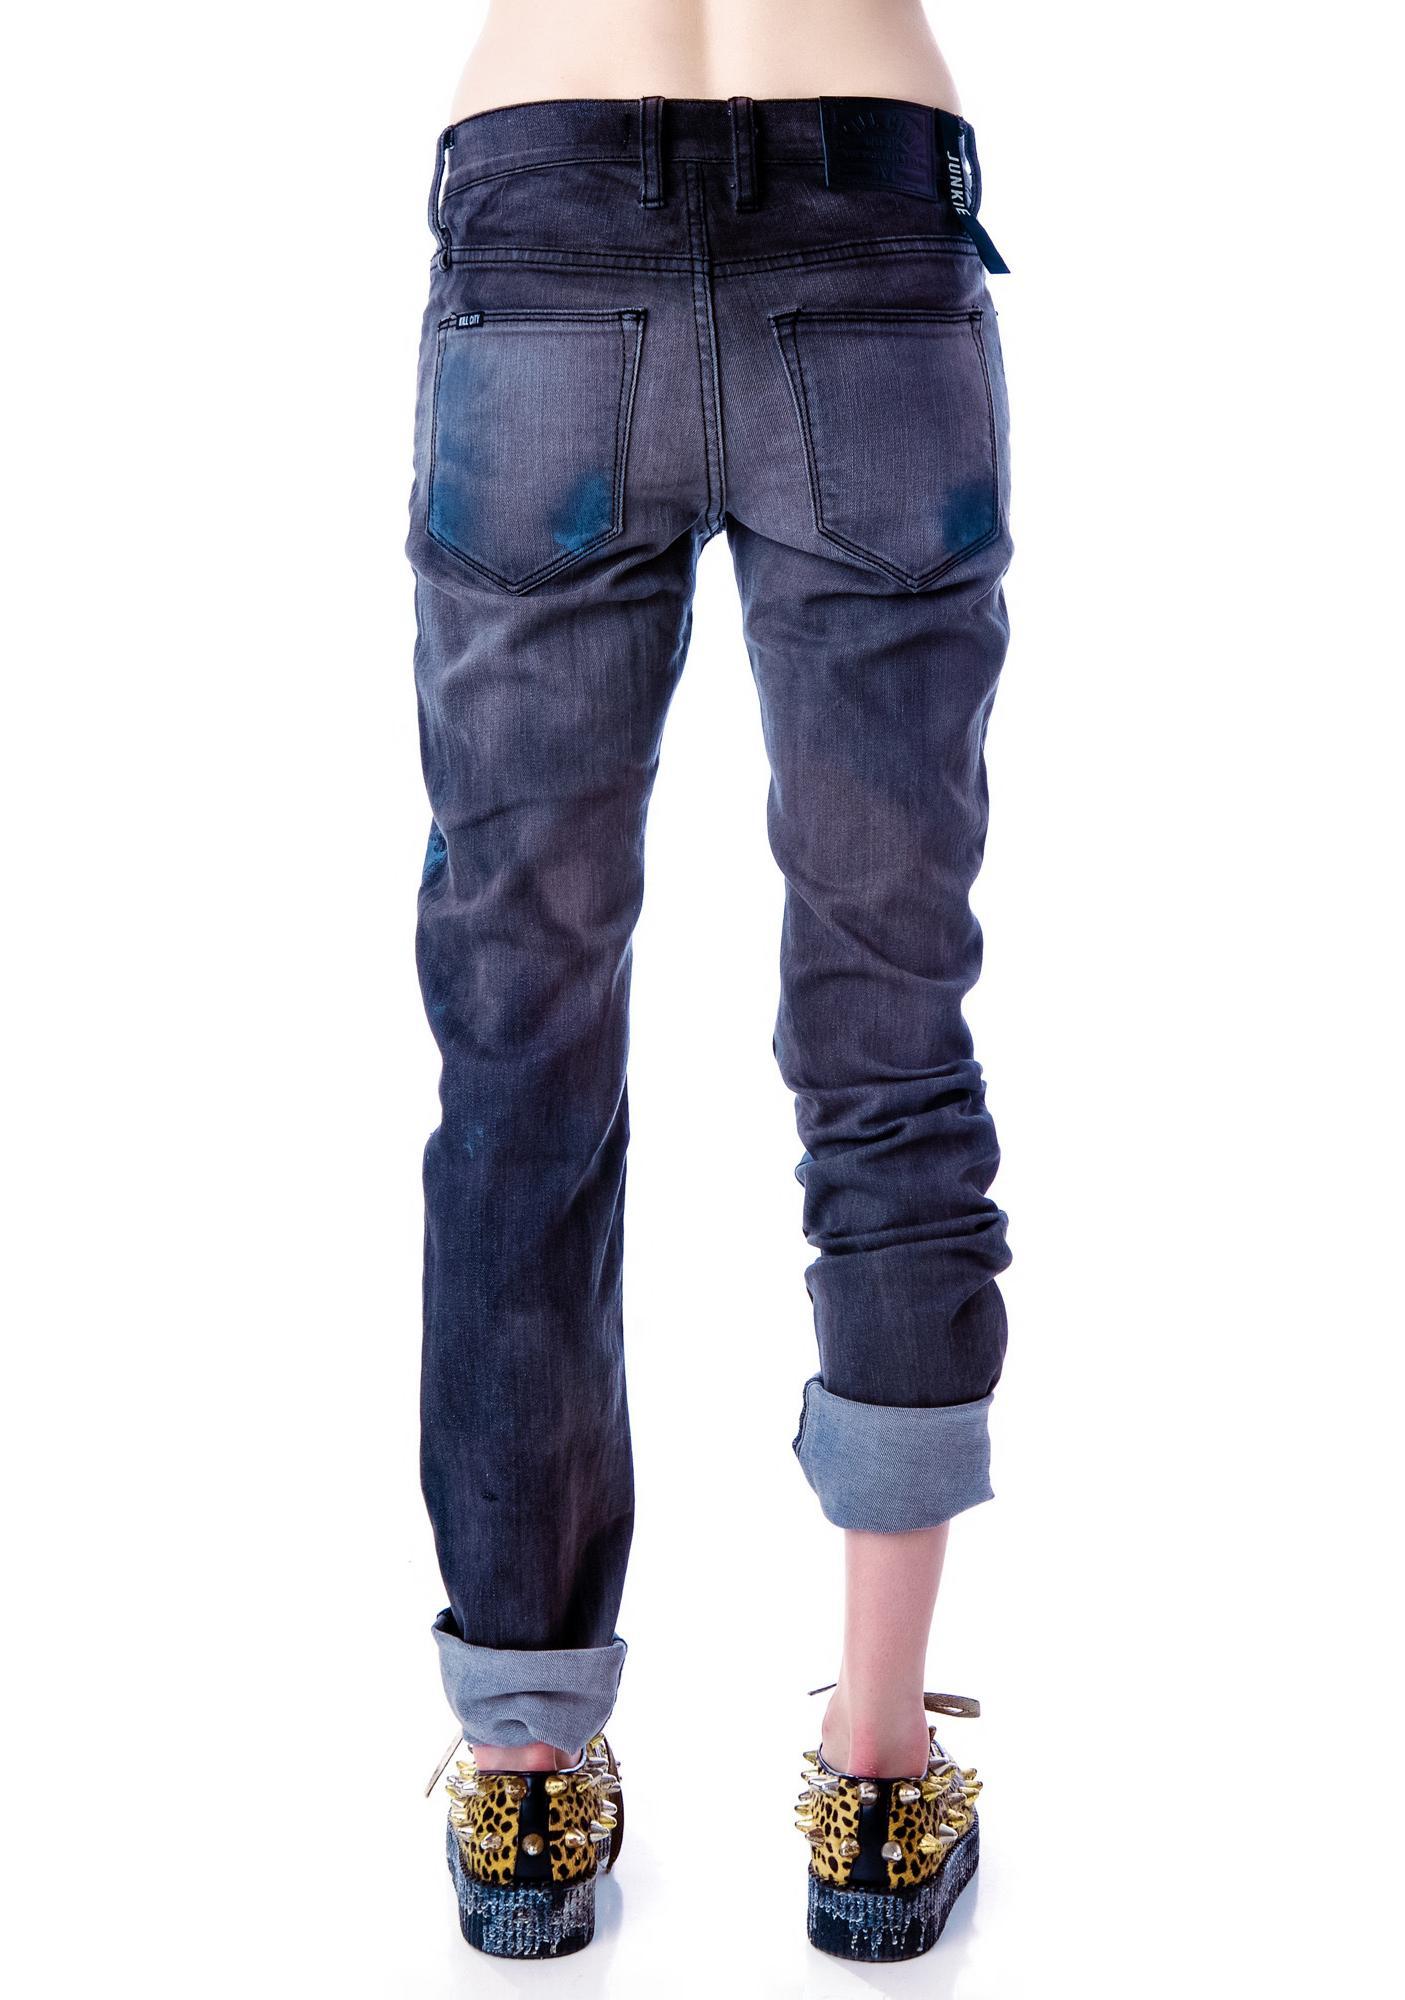 Kill City Paint Stain Junkie Jeans